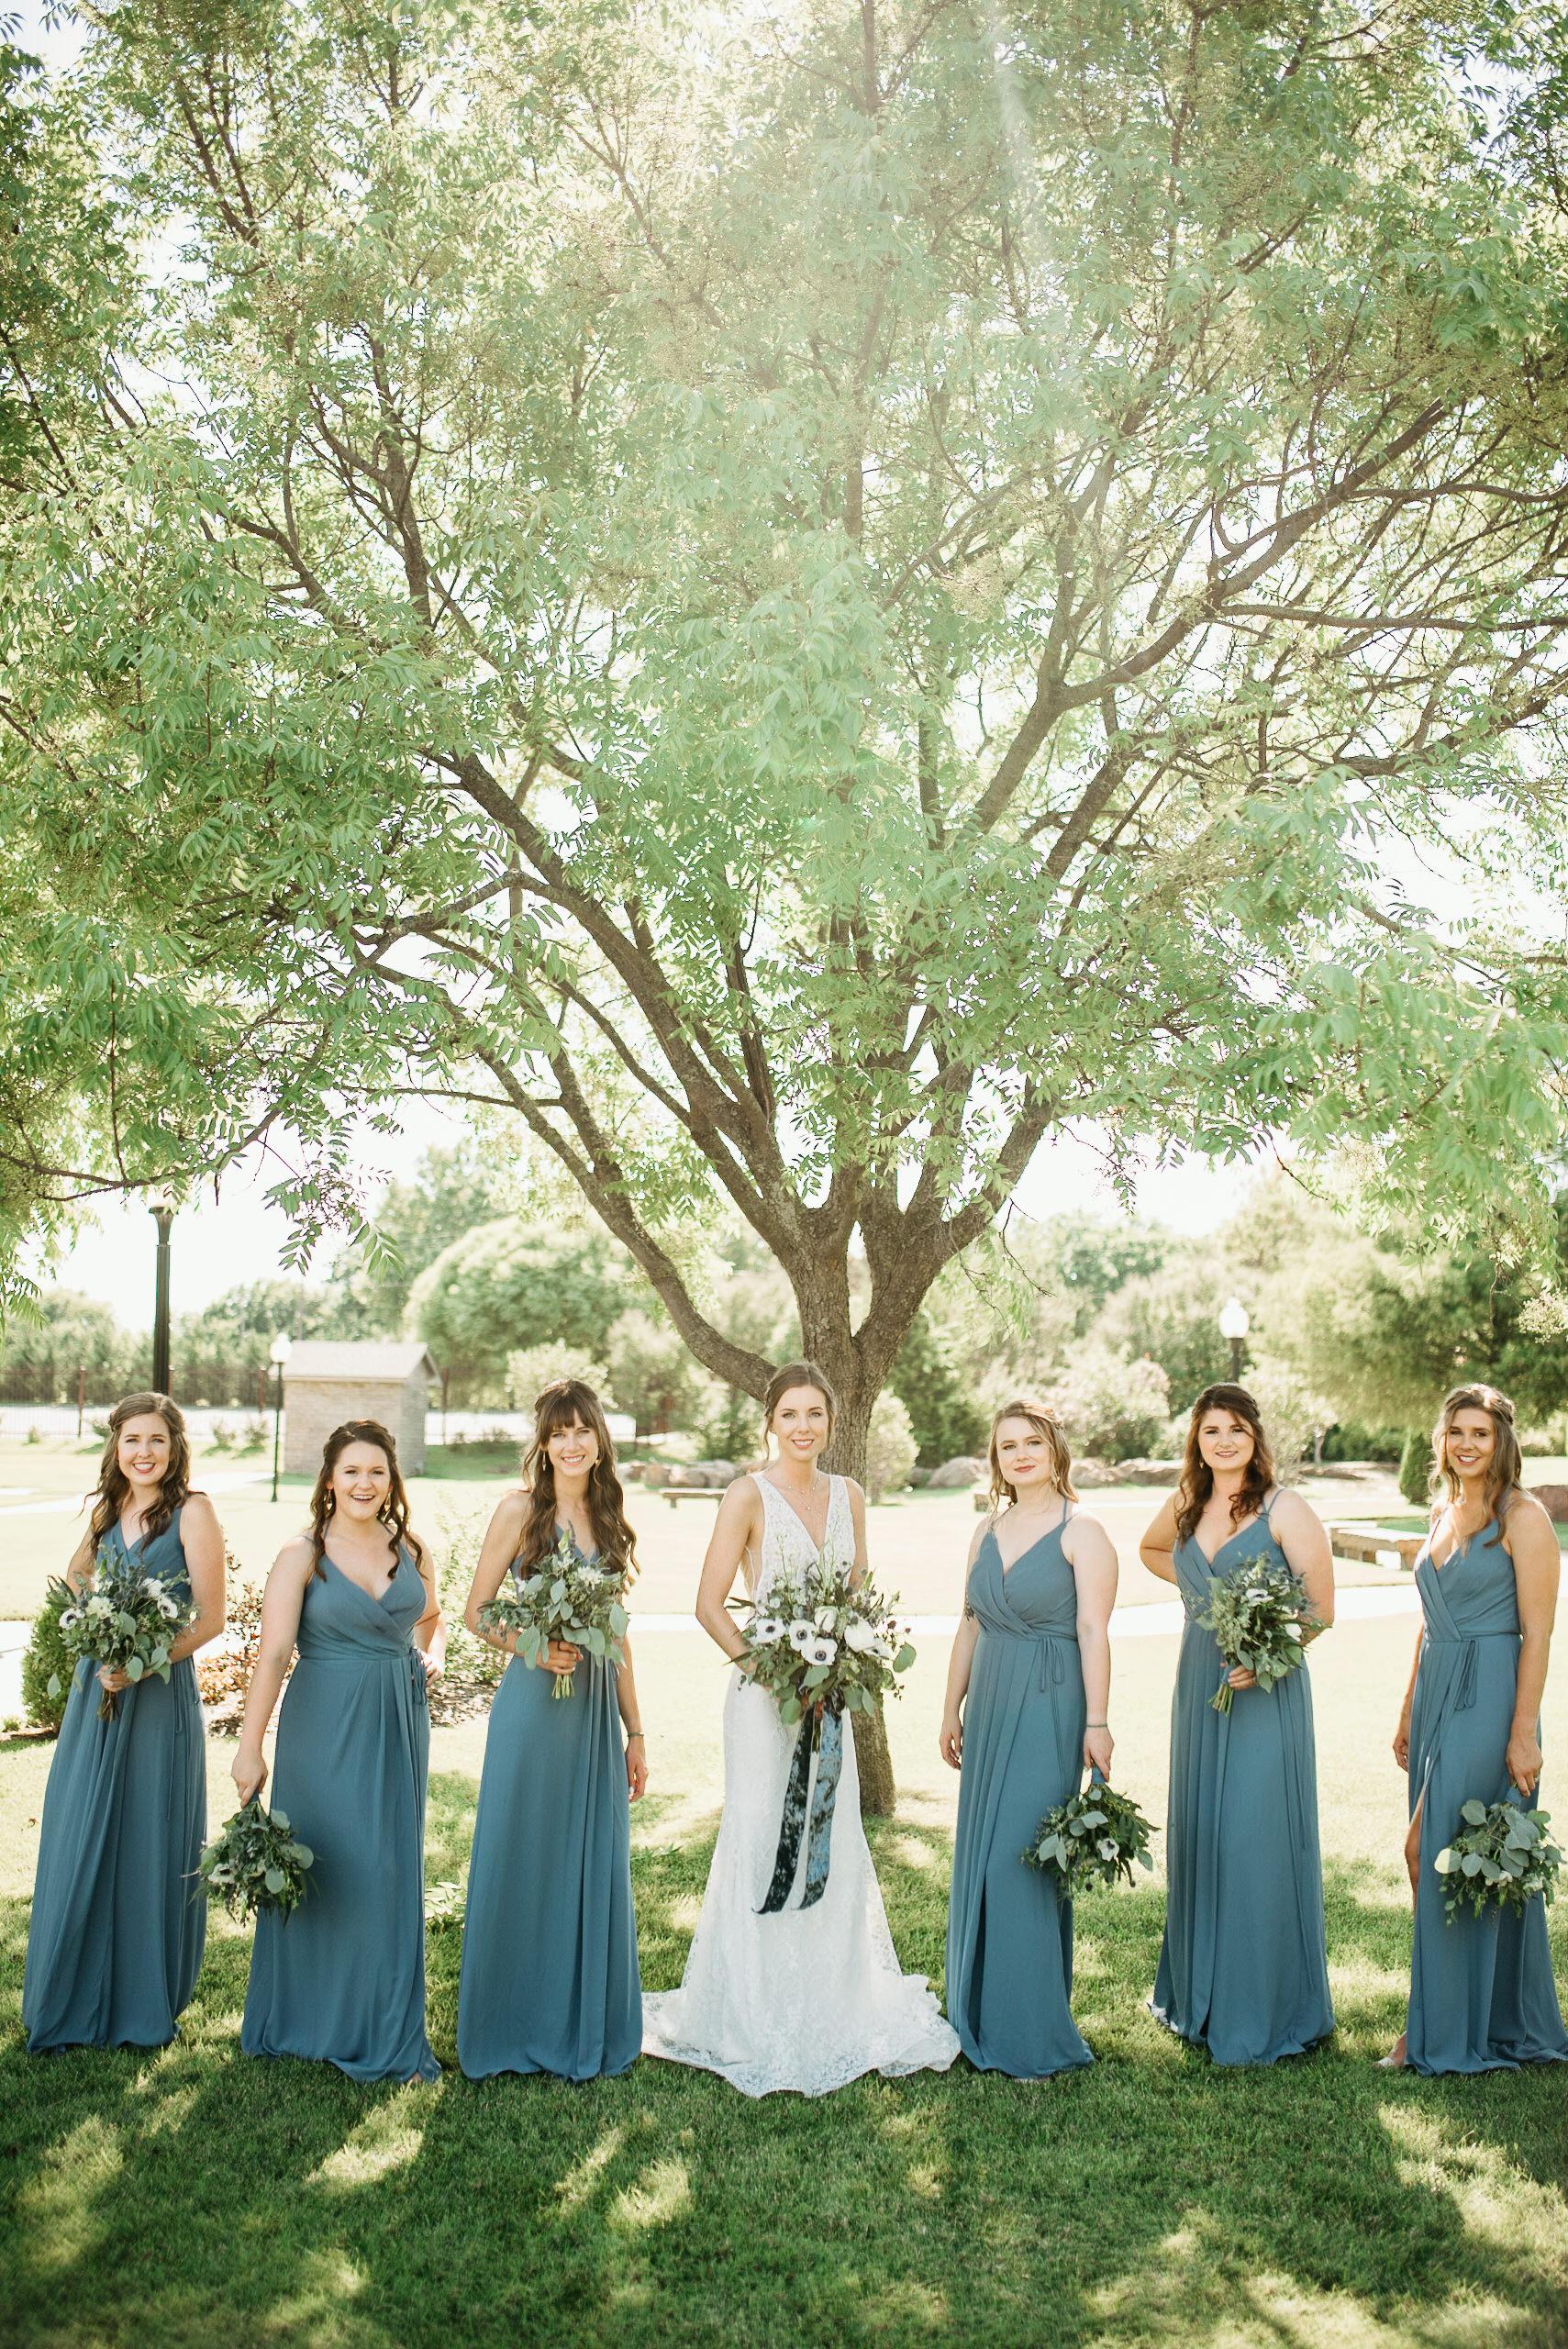 okc-wedding-photographer-coles-garden-wedding-okc-best-wedding-photographers-65.jpg